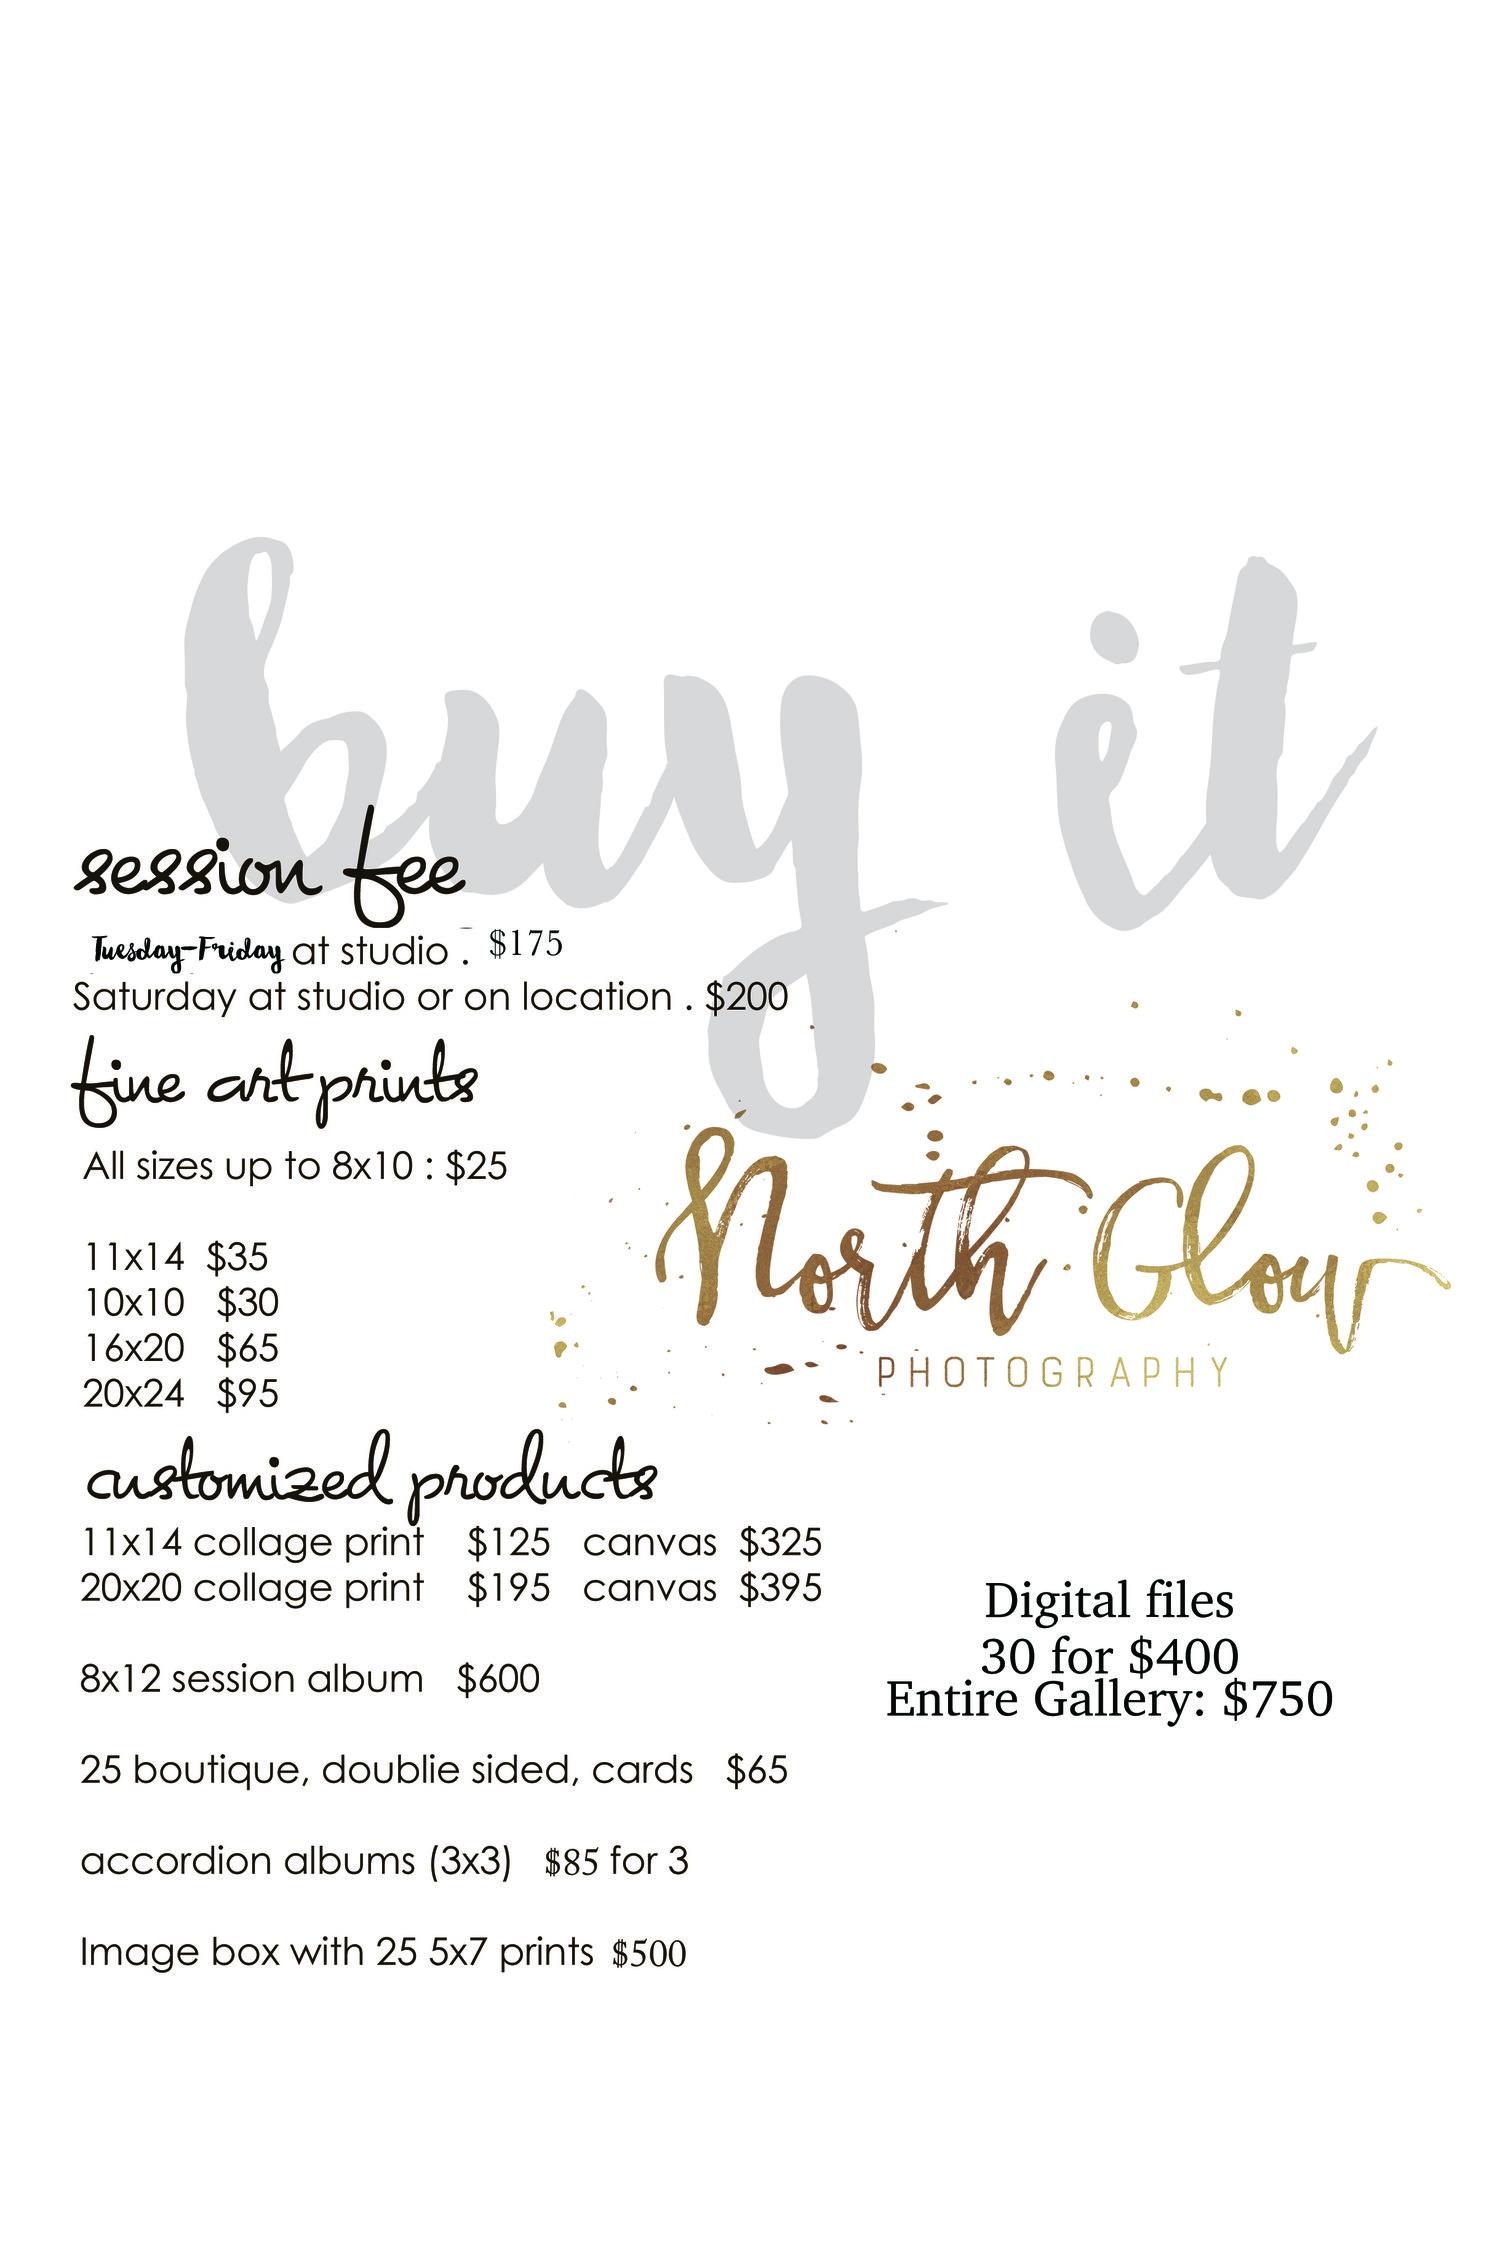 A La Carte Print Pricing — North Glow PHOTOGRAPHY